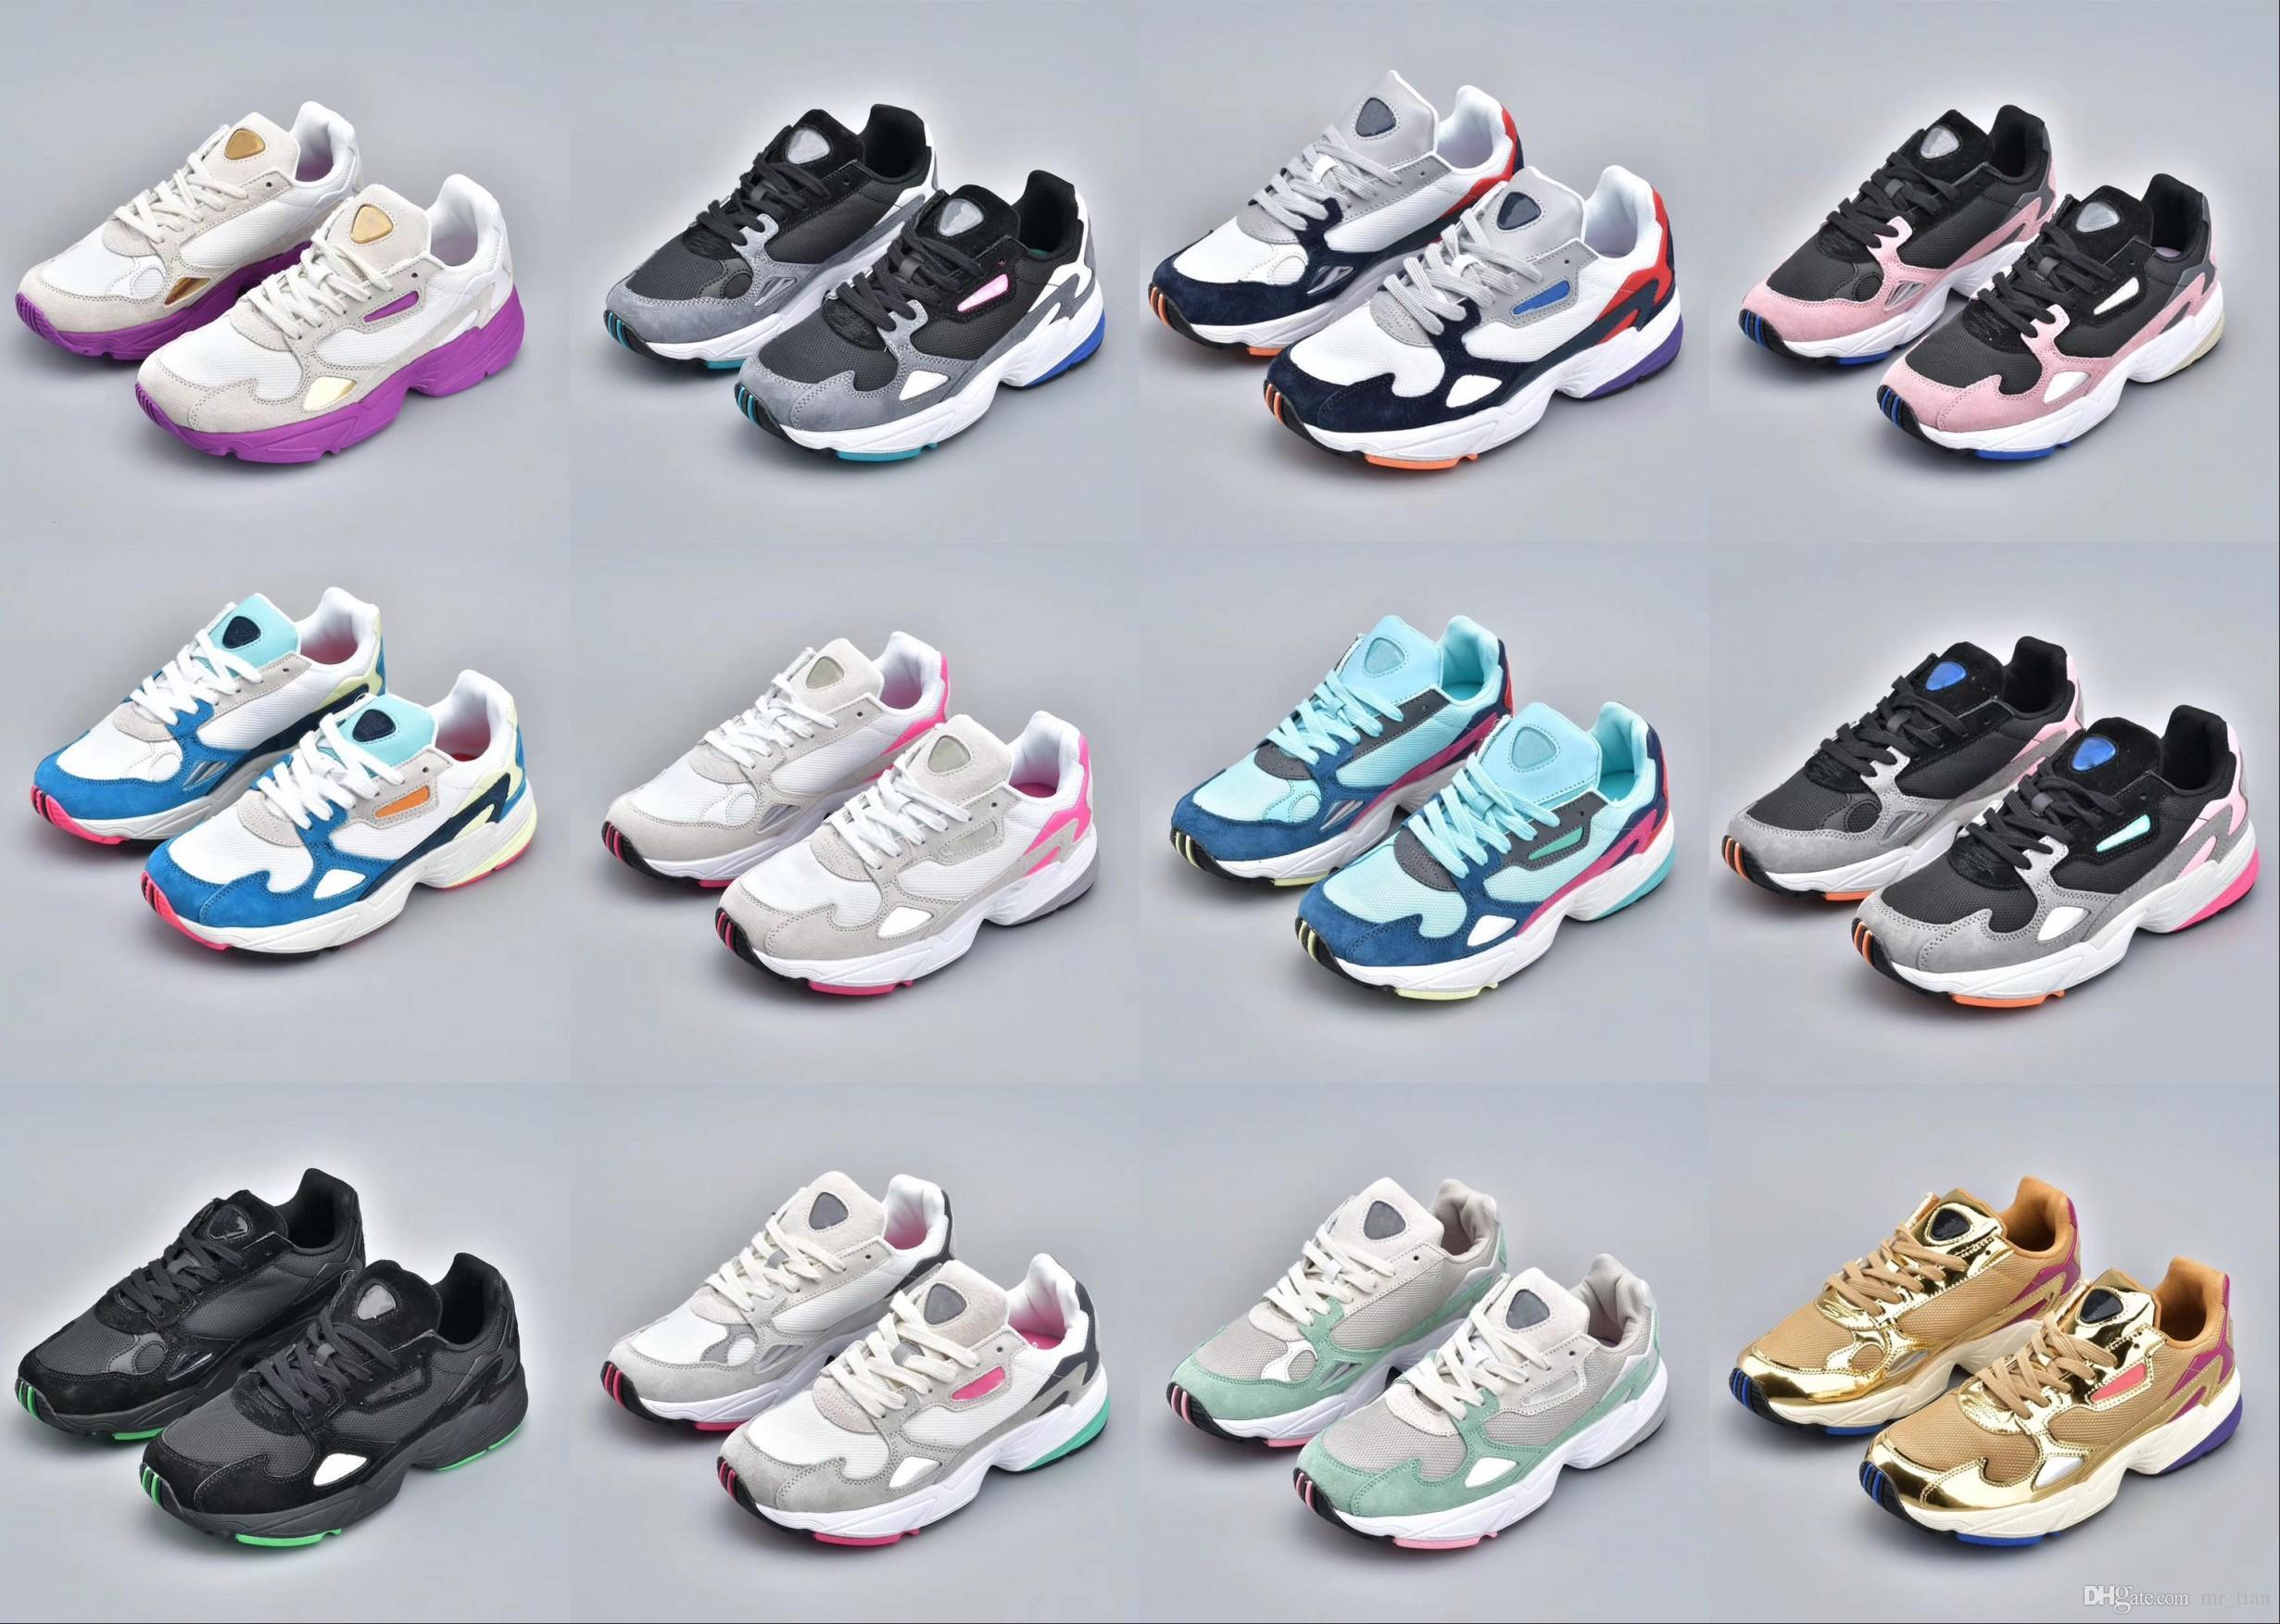 check out d474c 36323 Adidas Falcon W Running Shoes 2019 NUEVOS Zapatos Para Correr De Alta  Calidad FALCON W Para Hombres Y Mujeres, Zapatos Deportivos De Moda Tamaño  36 45 Por ...